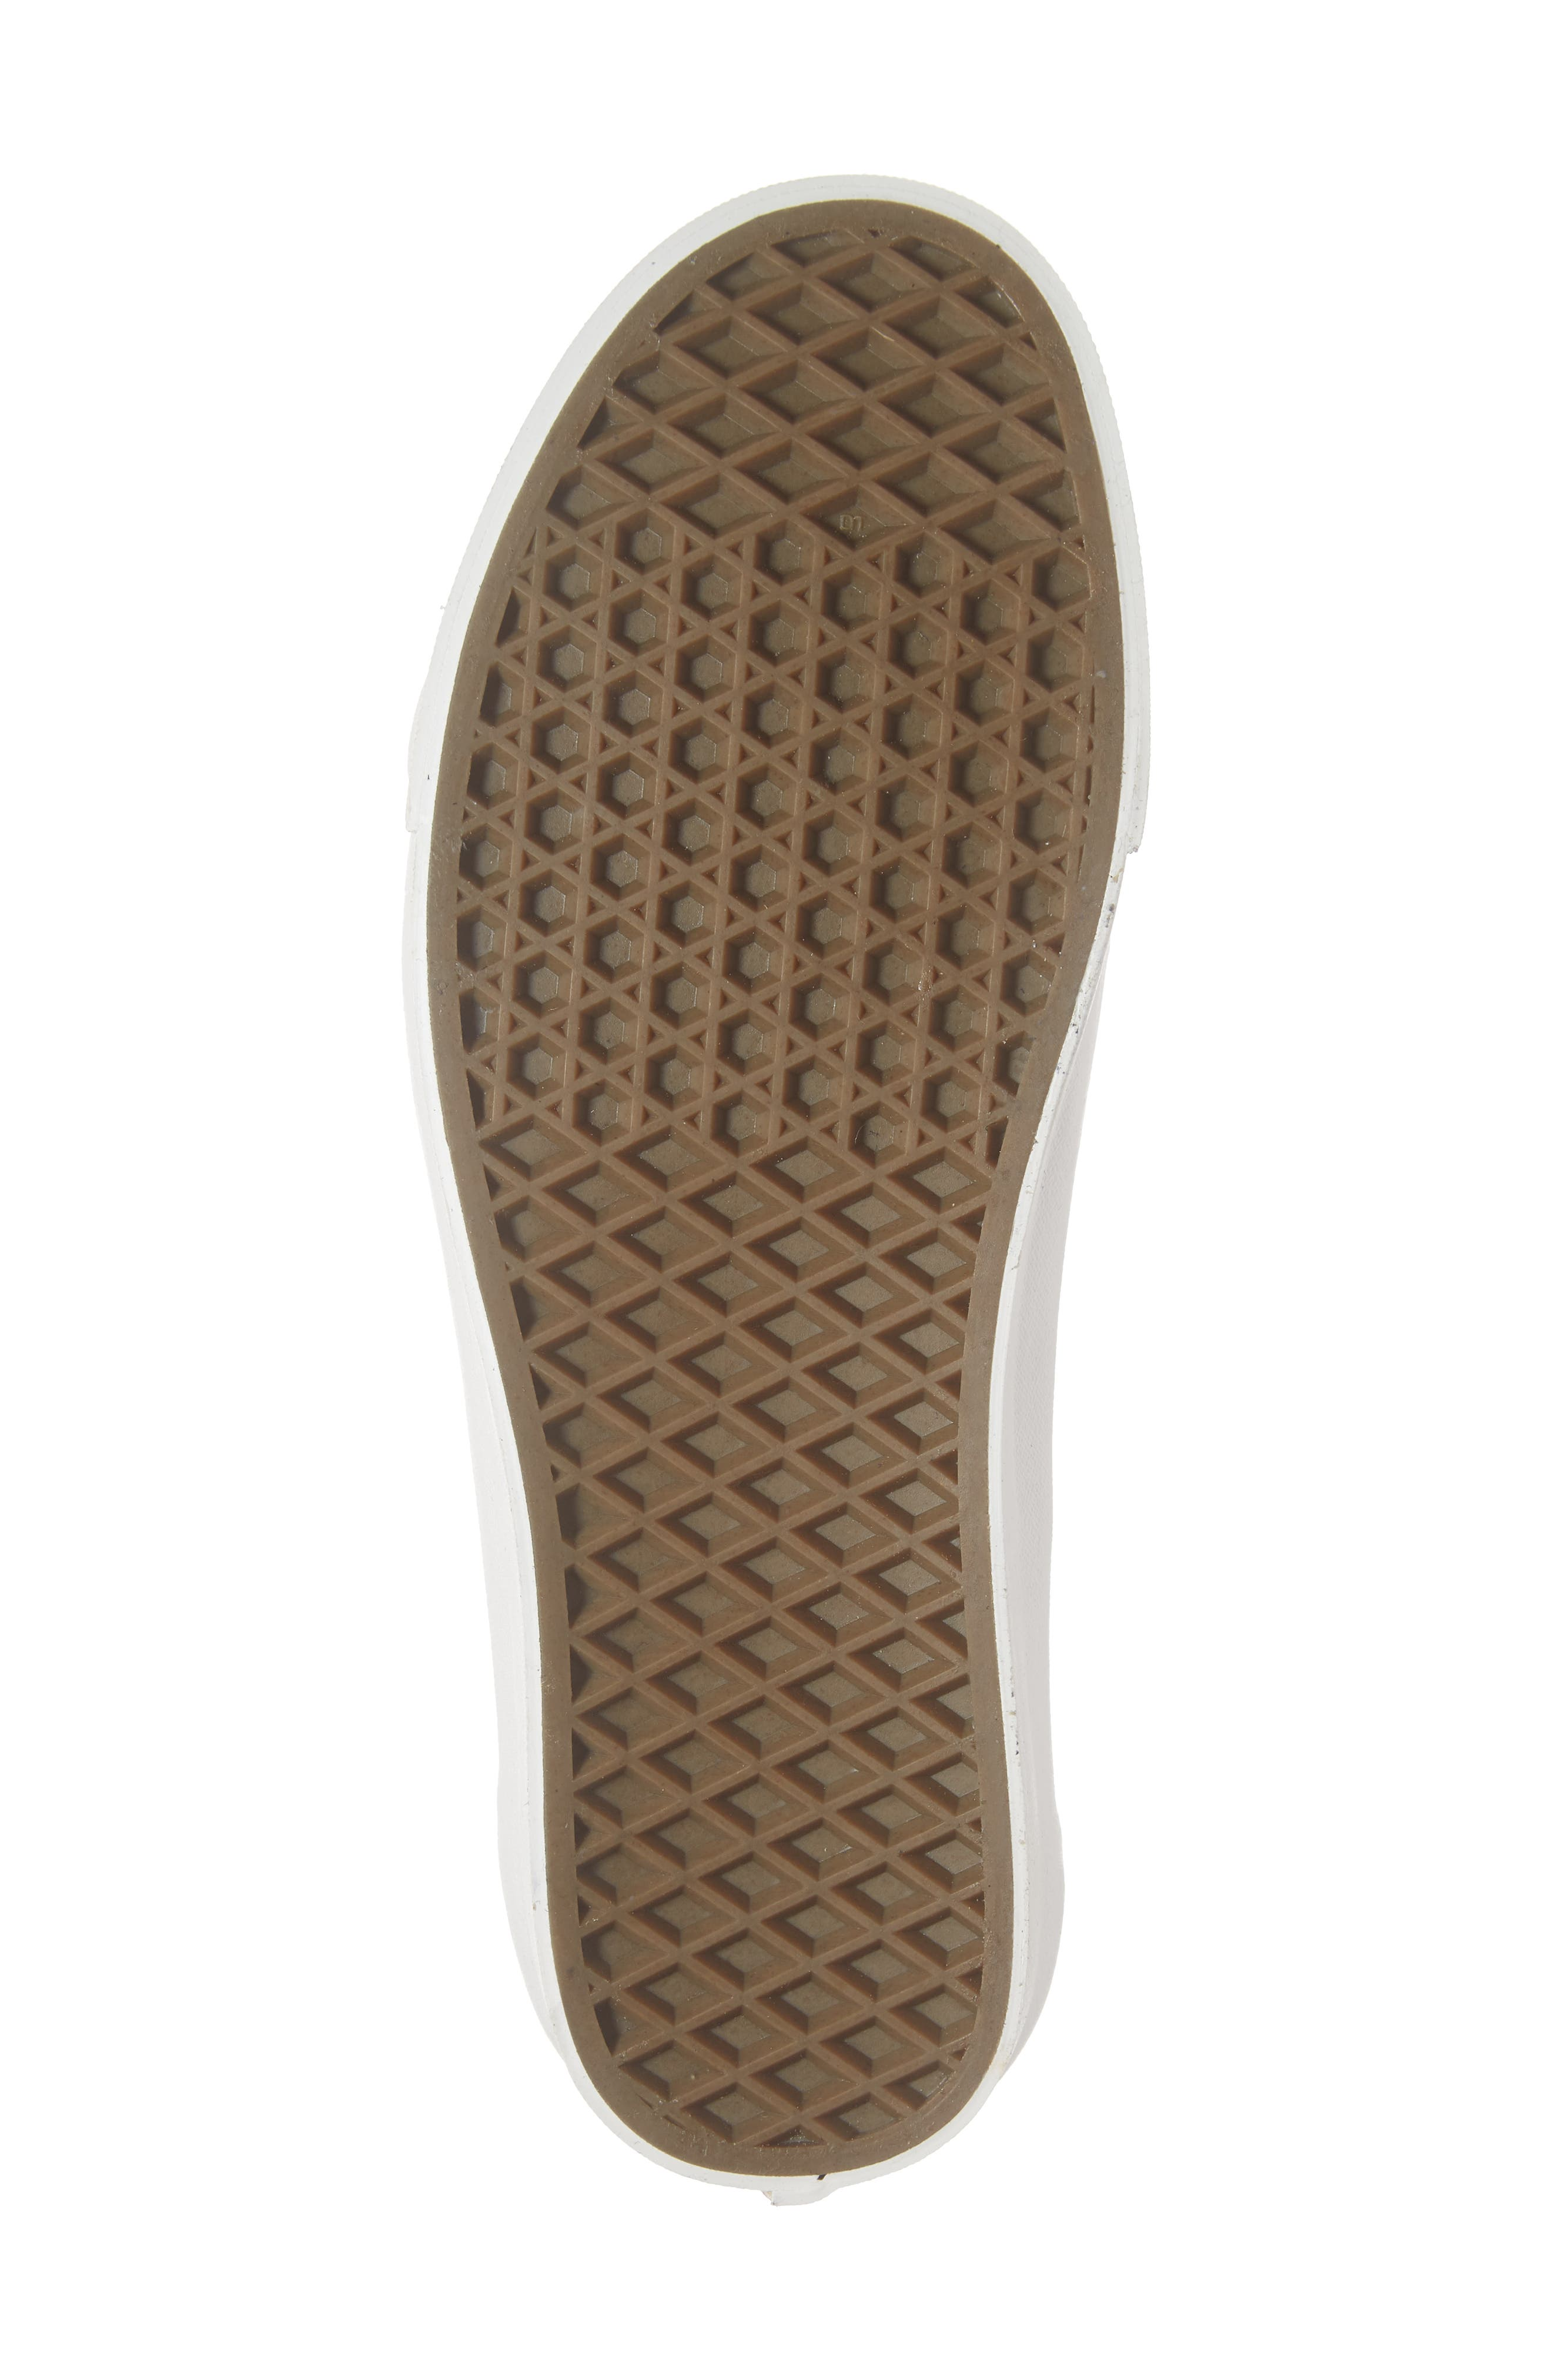 Anaheim Factory Old Skool 36 DX Sneaker,                             Alternate thumbnail 6, color,                             NAVY/ SUEDE/ CORDUROY